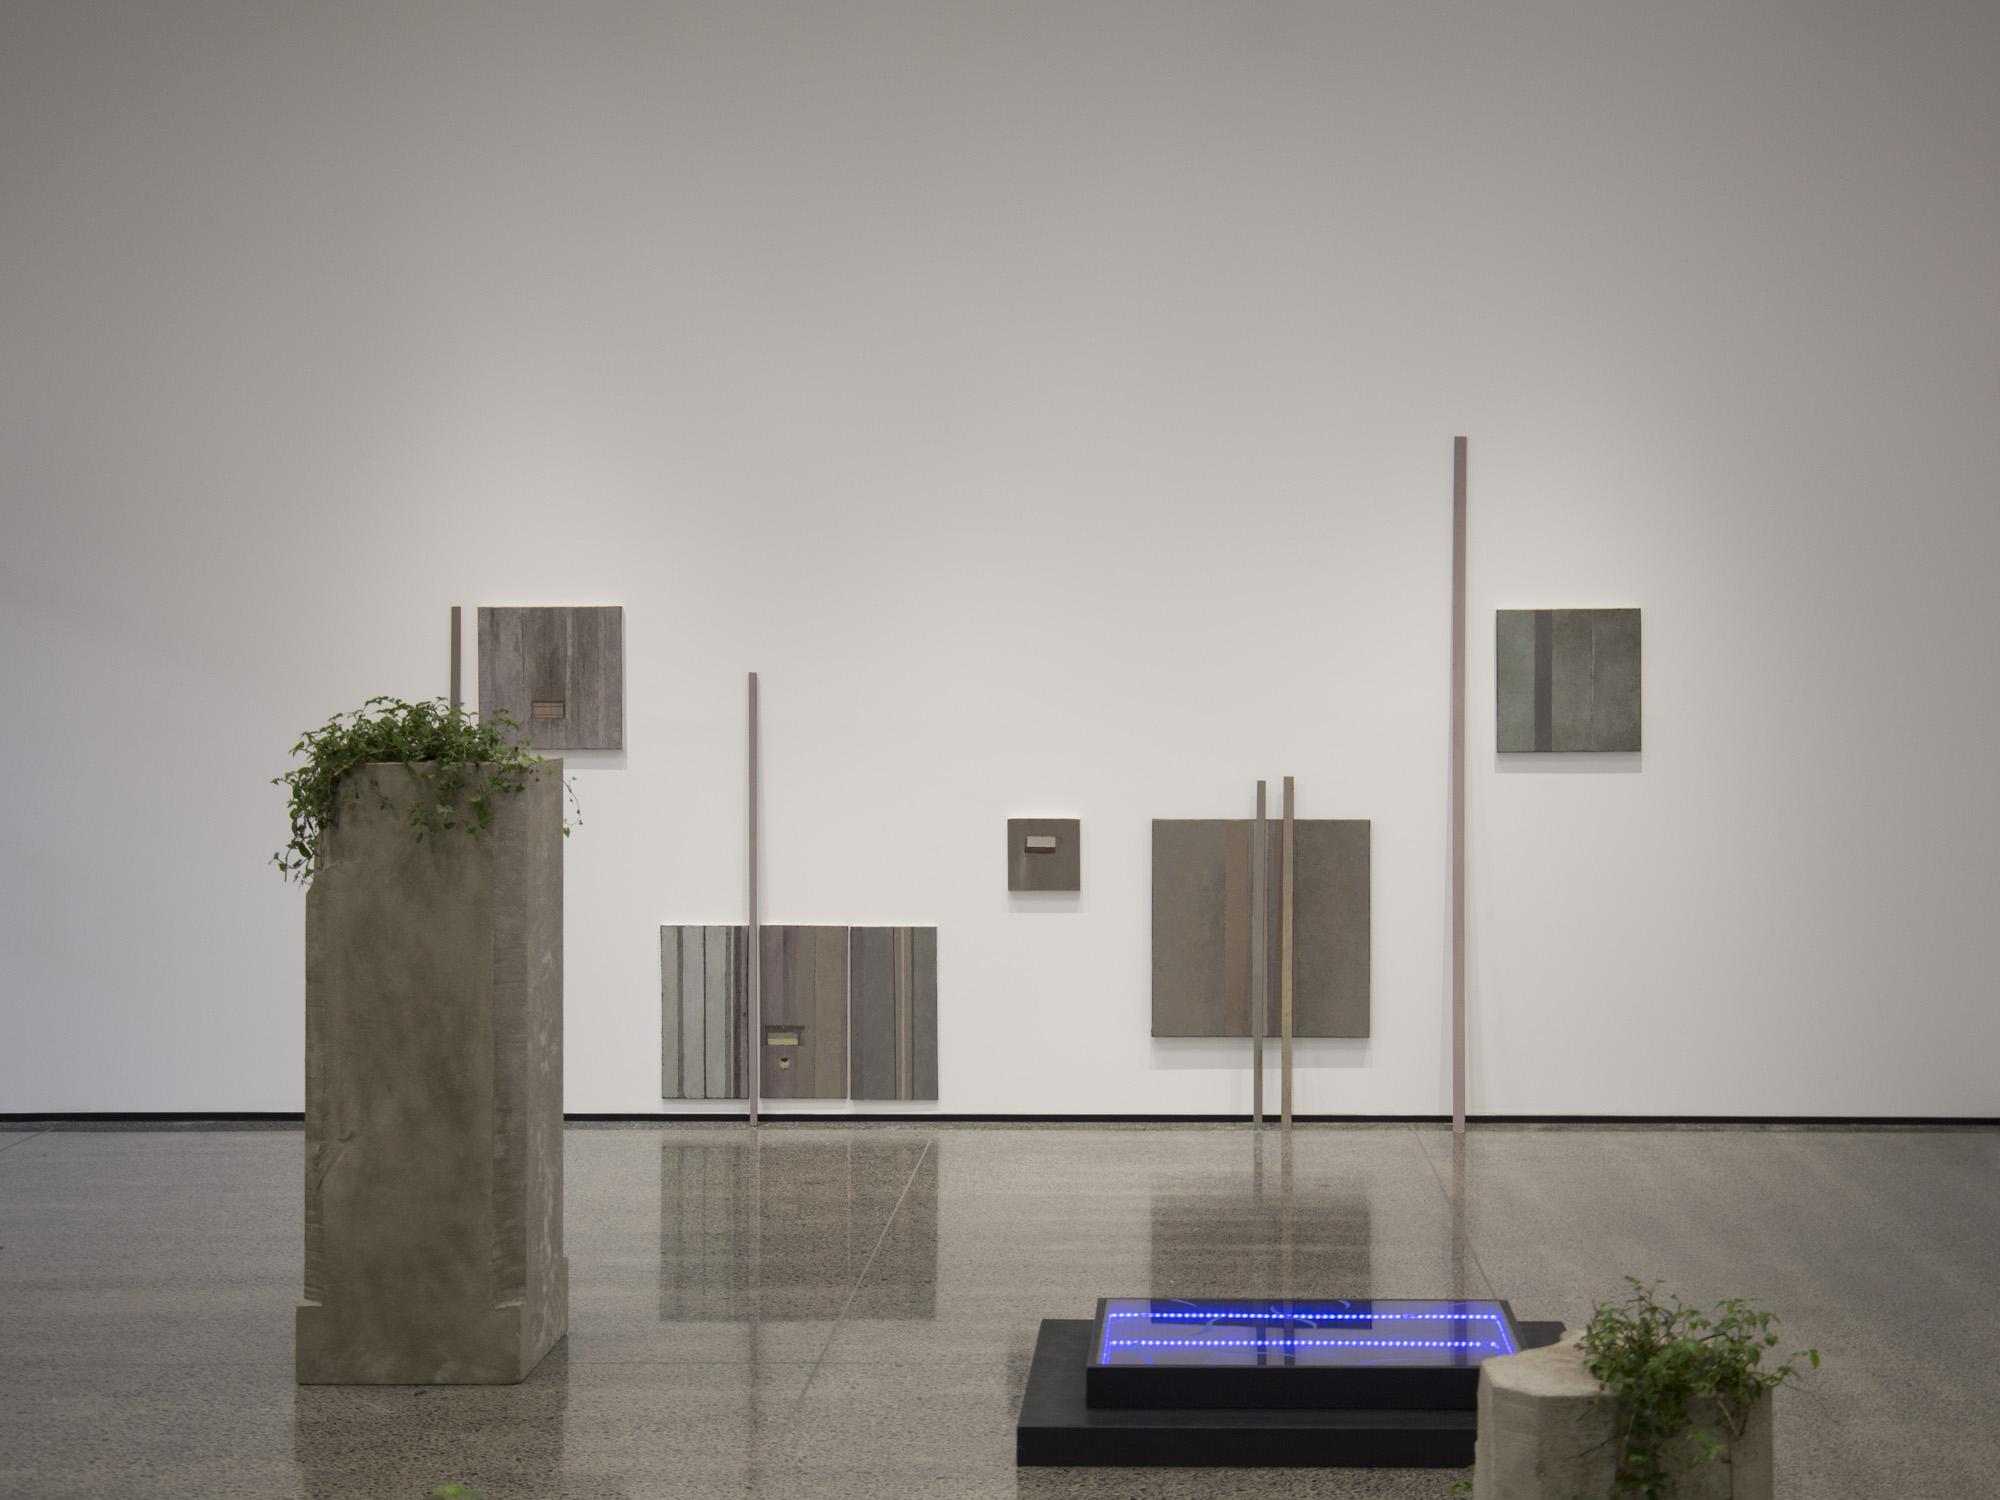 Front to back: Claudia Dunes  Impluvium , 2016; Julia Teale,  Concrete, Matters , 2016